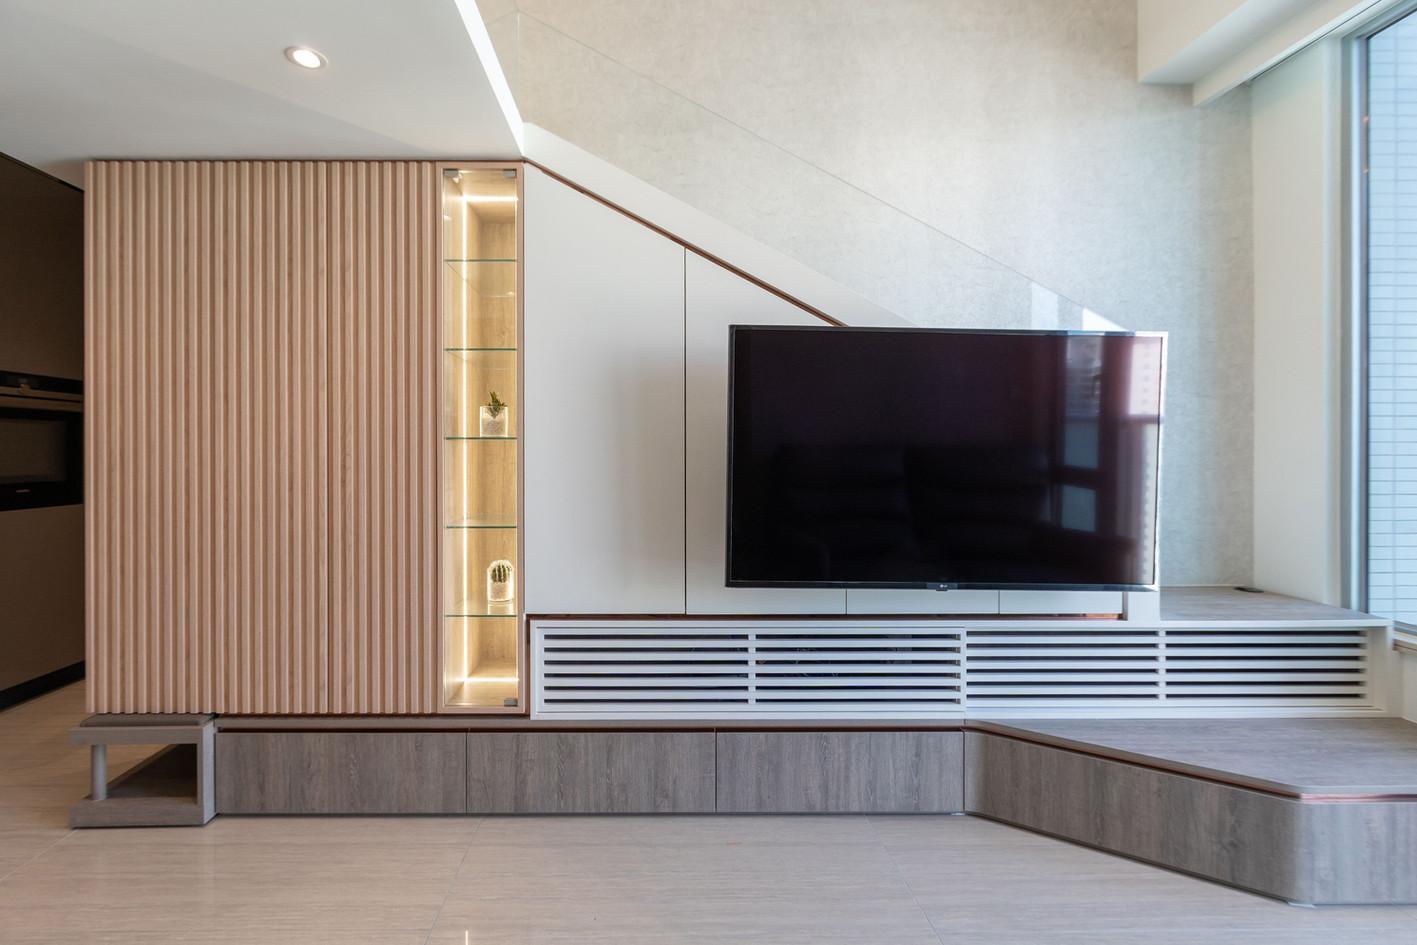 MNOP Design - Cullinan West II